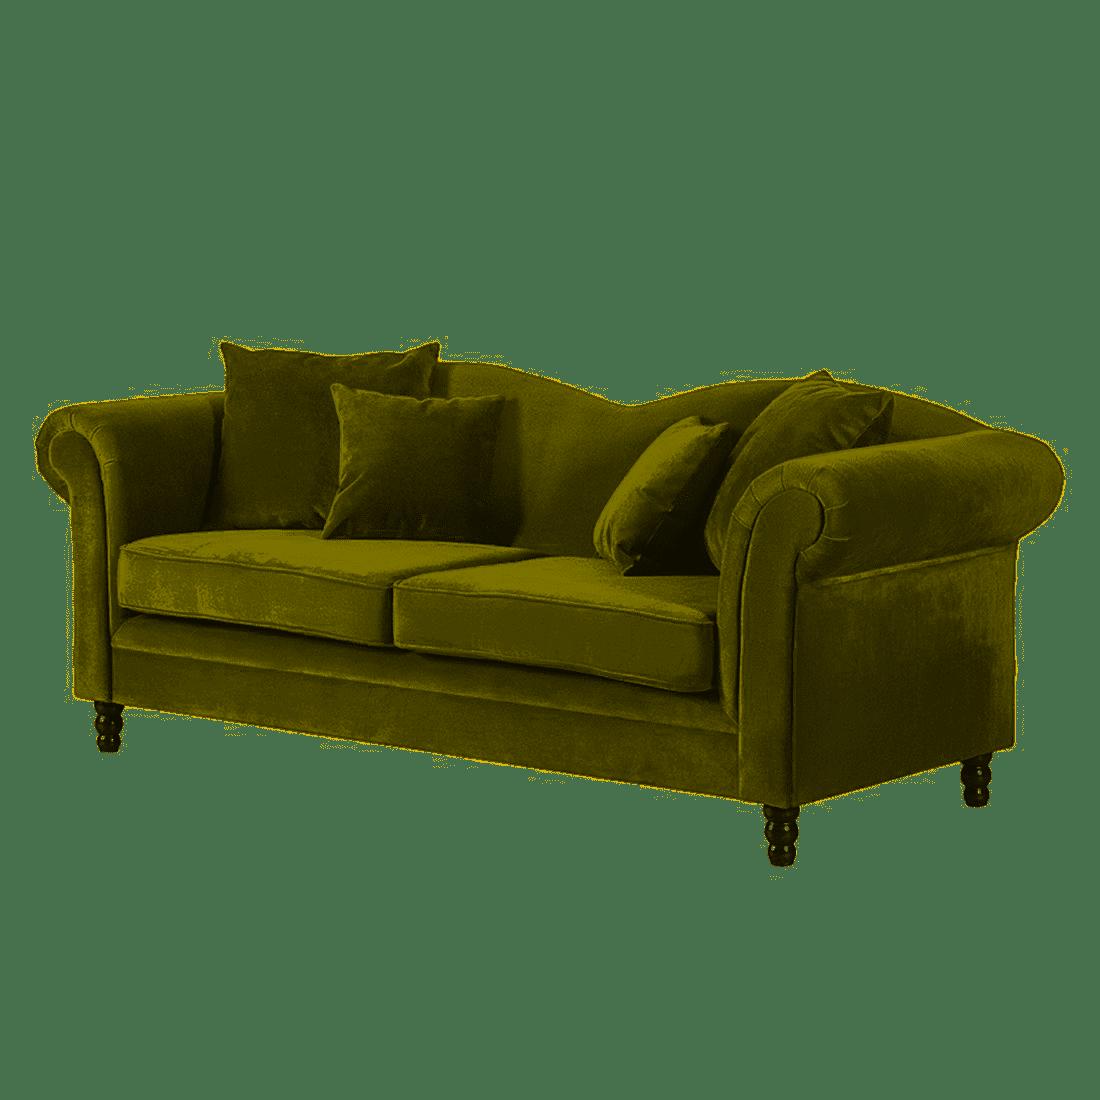 Sofa York 3 Sitzer Samt Google Suche Poltrone Pinta